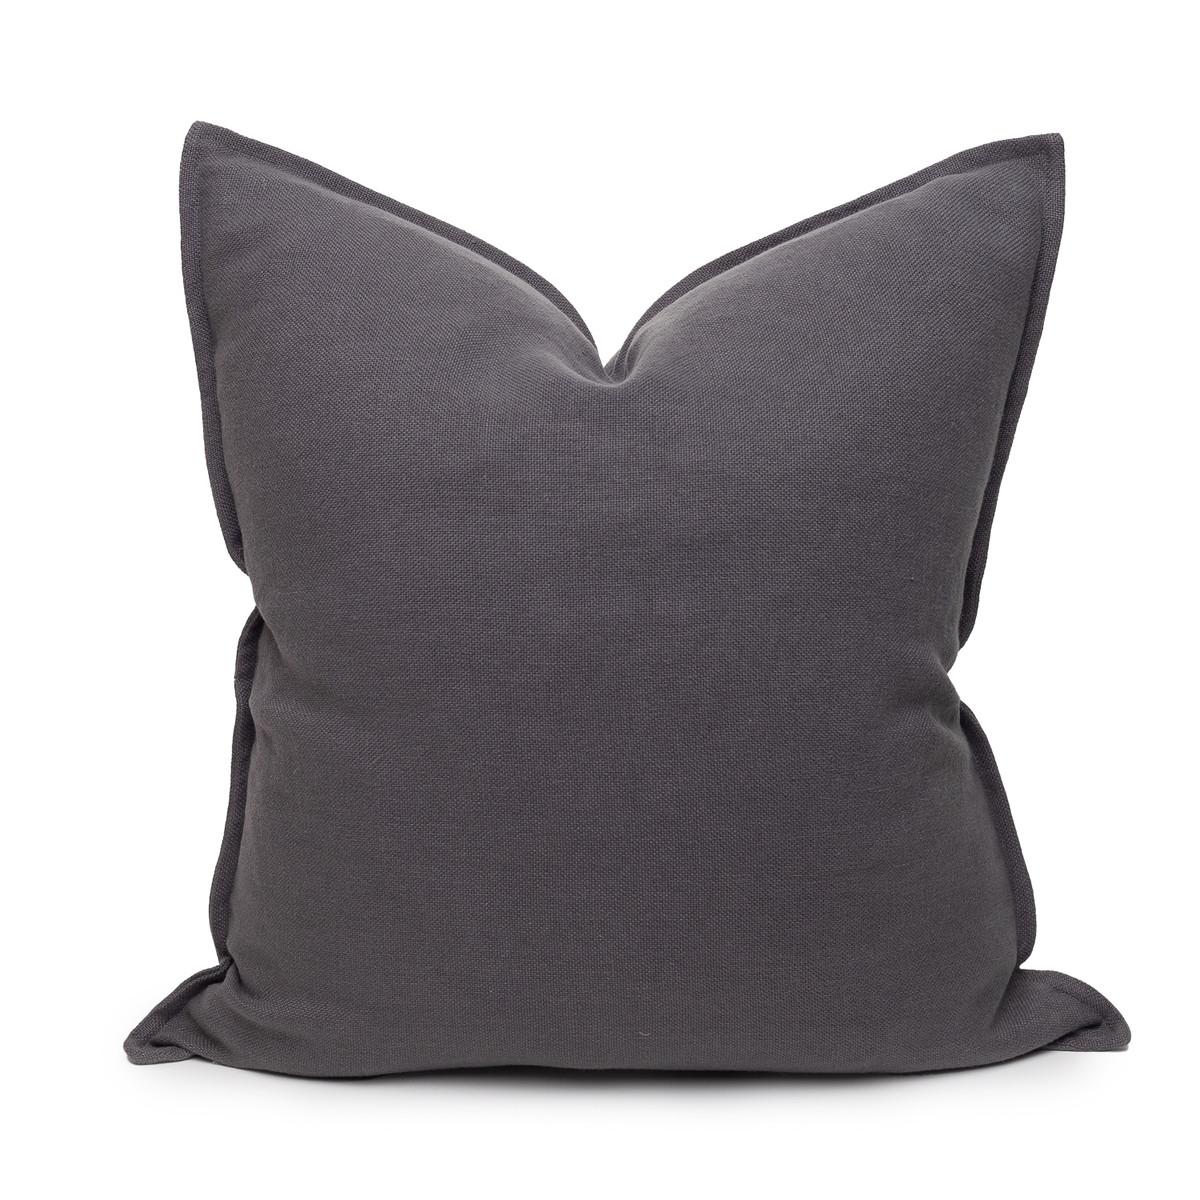 Simone PURE LINEN Pillow 22 Charcoal - Front